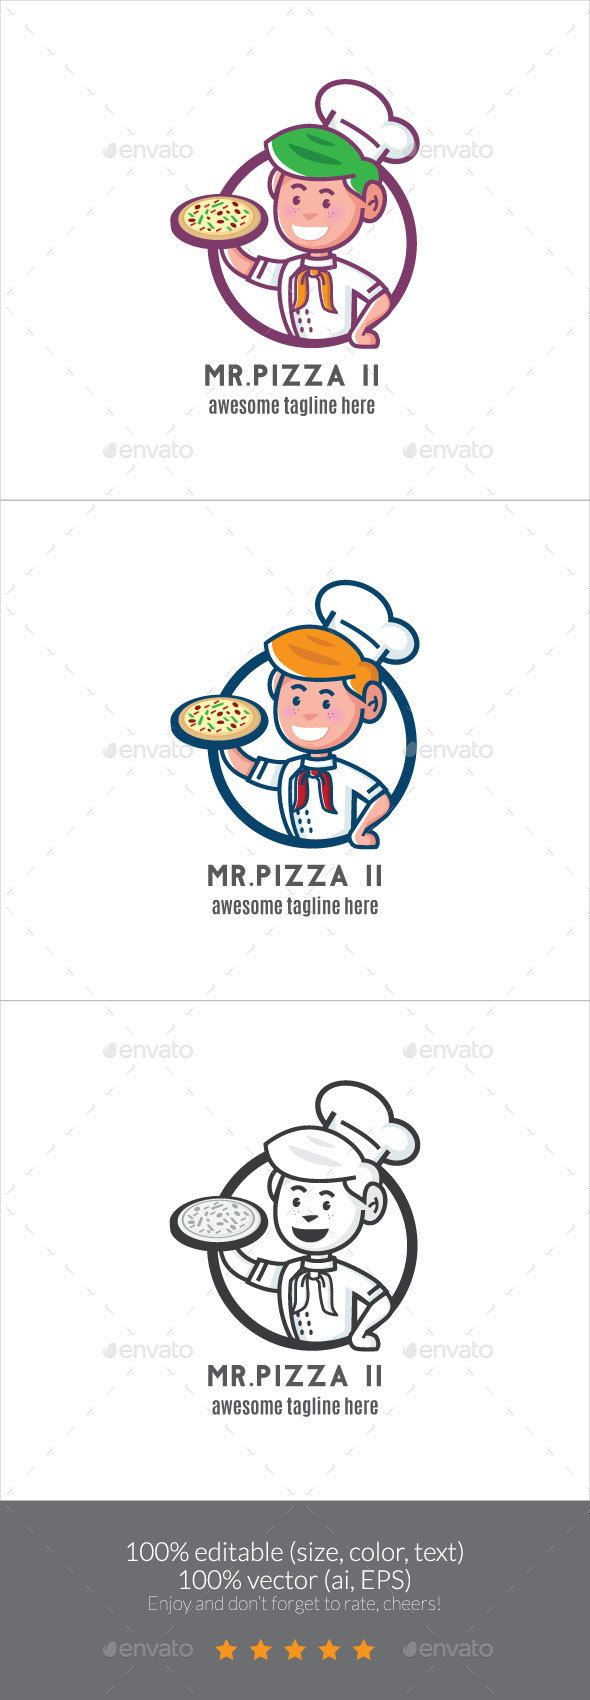 Mr. Pizza II Logo Mascot